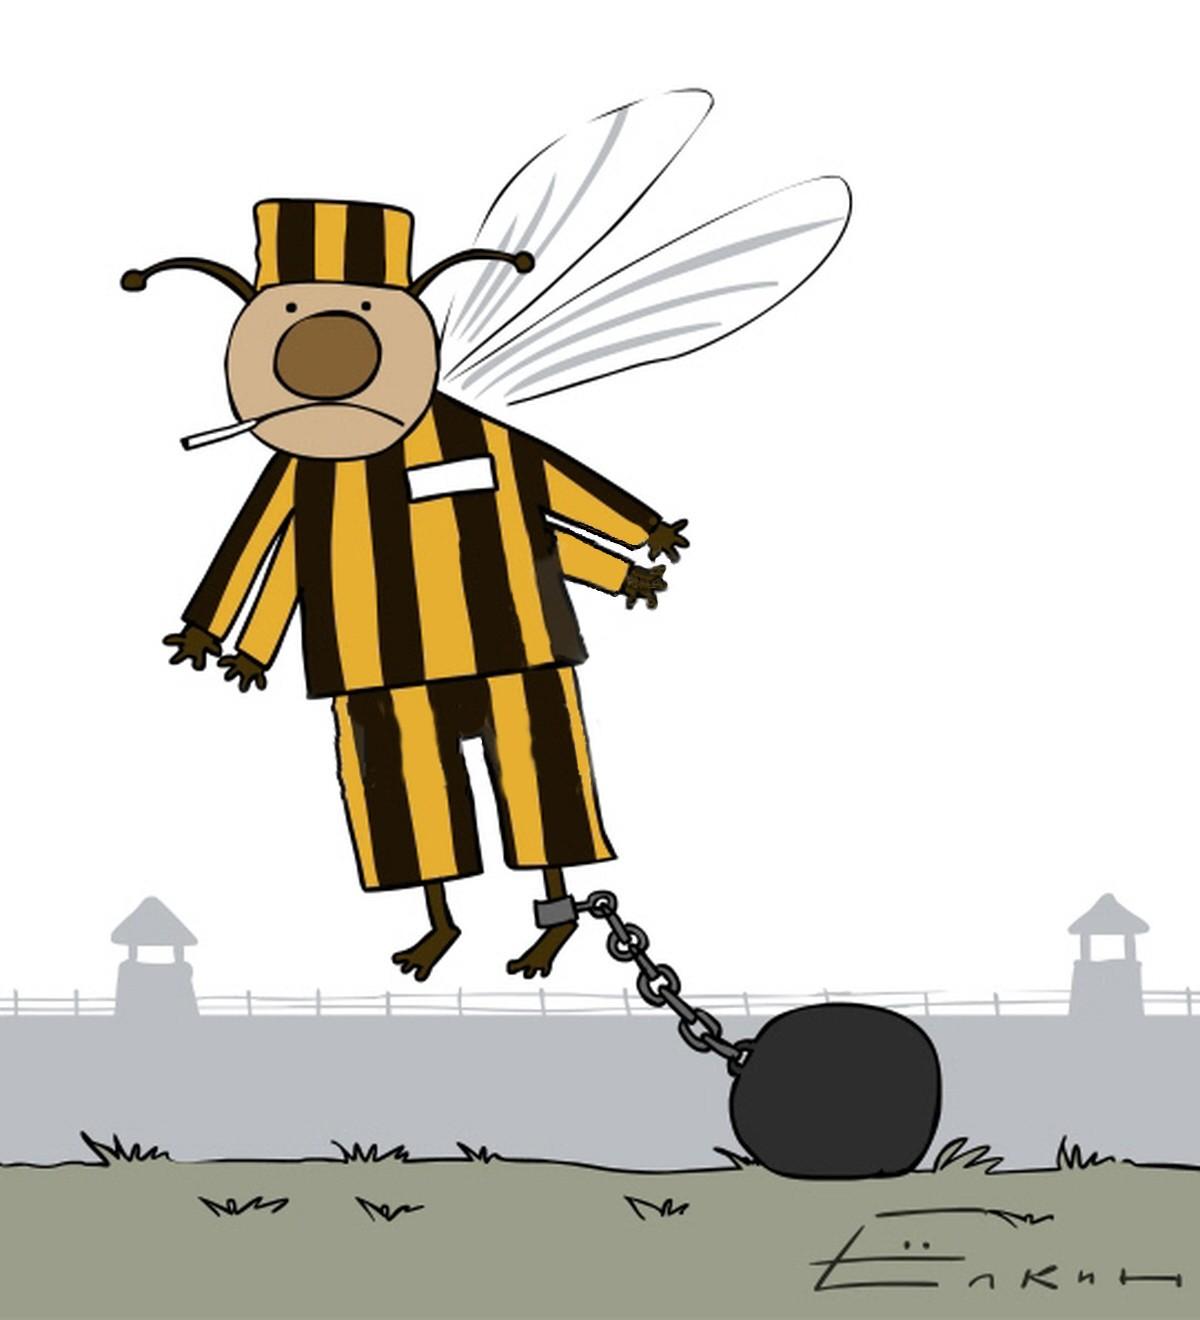 Sergei Yolkin. Bees in the Slammer. 2010